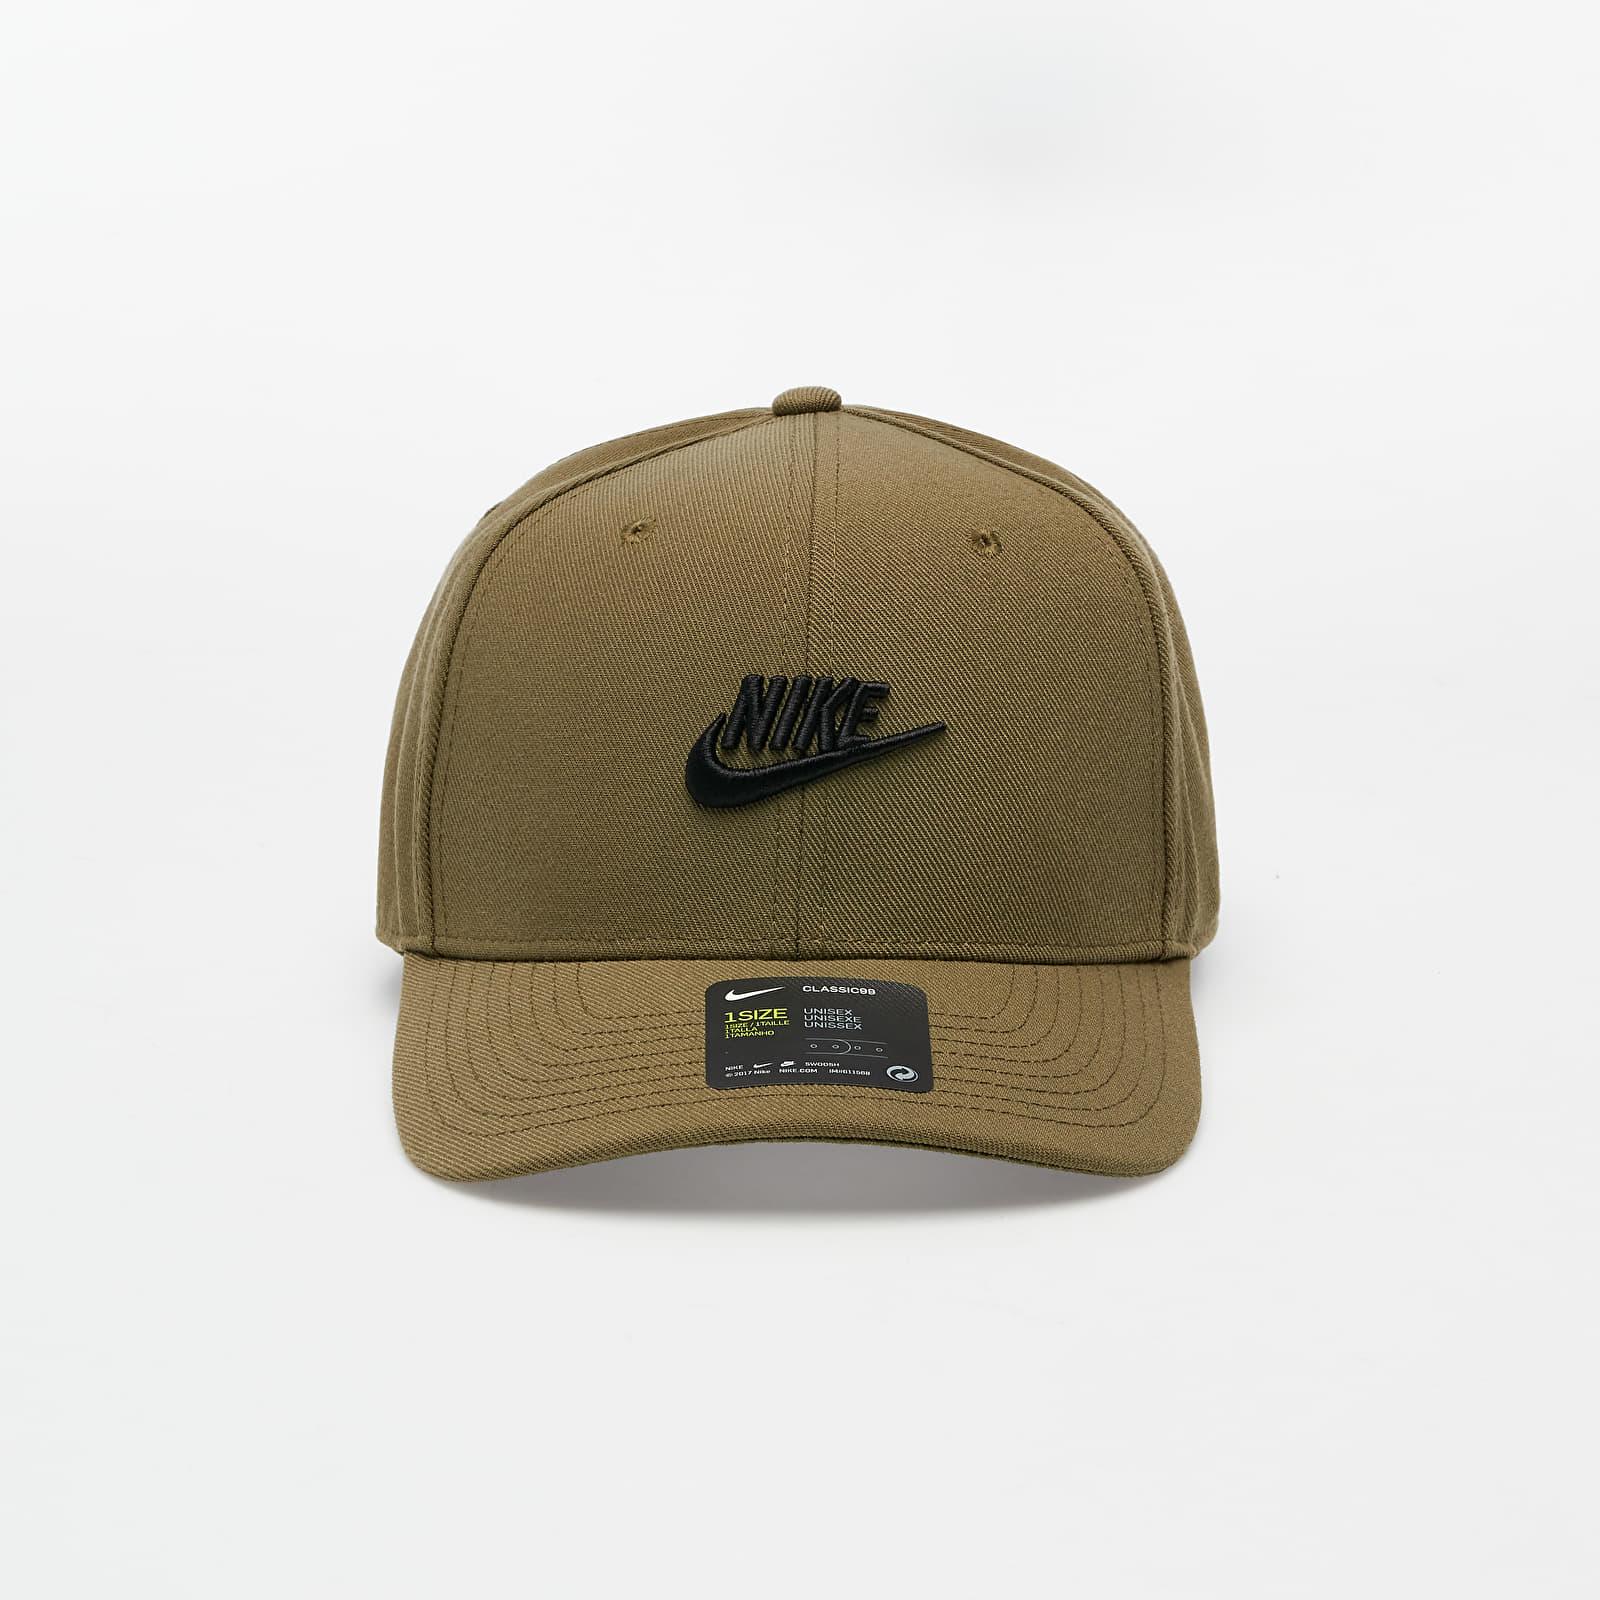 Kšiltovky Nike Sportswear CLC99 Fut Snapback Medium Olive/ Black